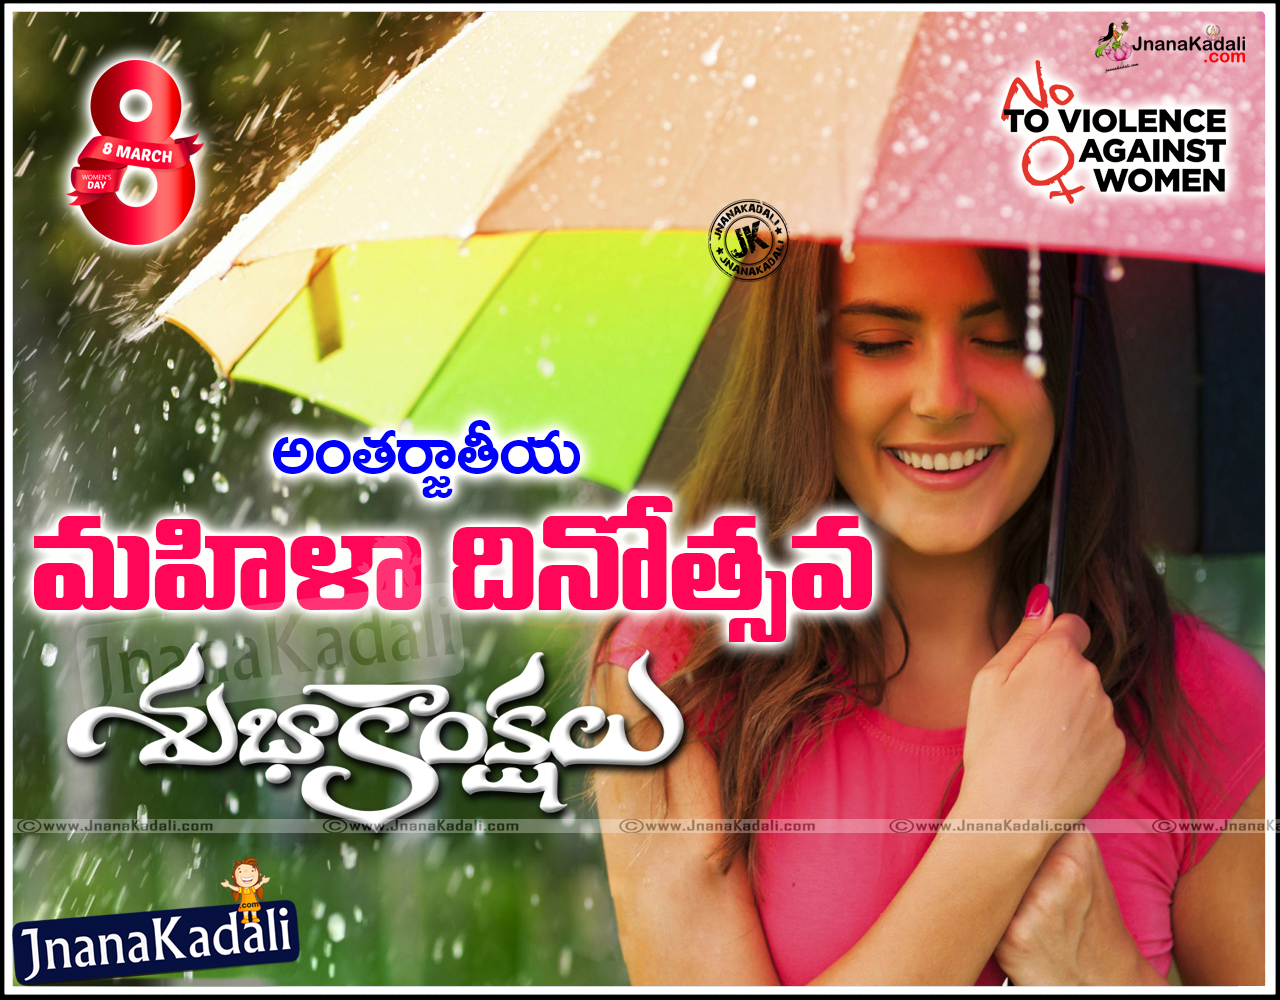 Womens Day Quotations And Greetings In Telugu Jnana Kadalicom